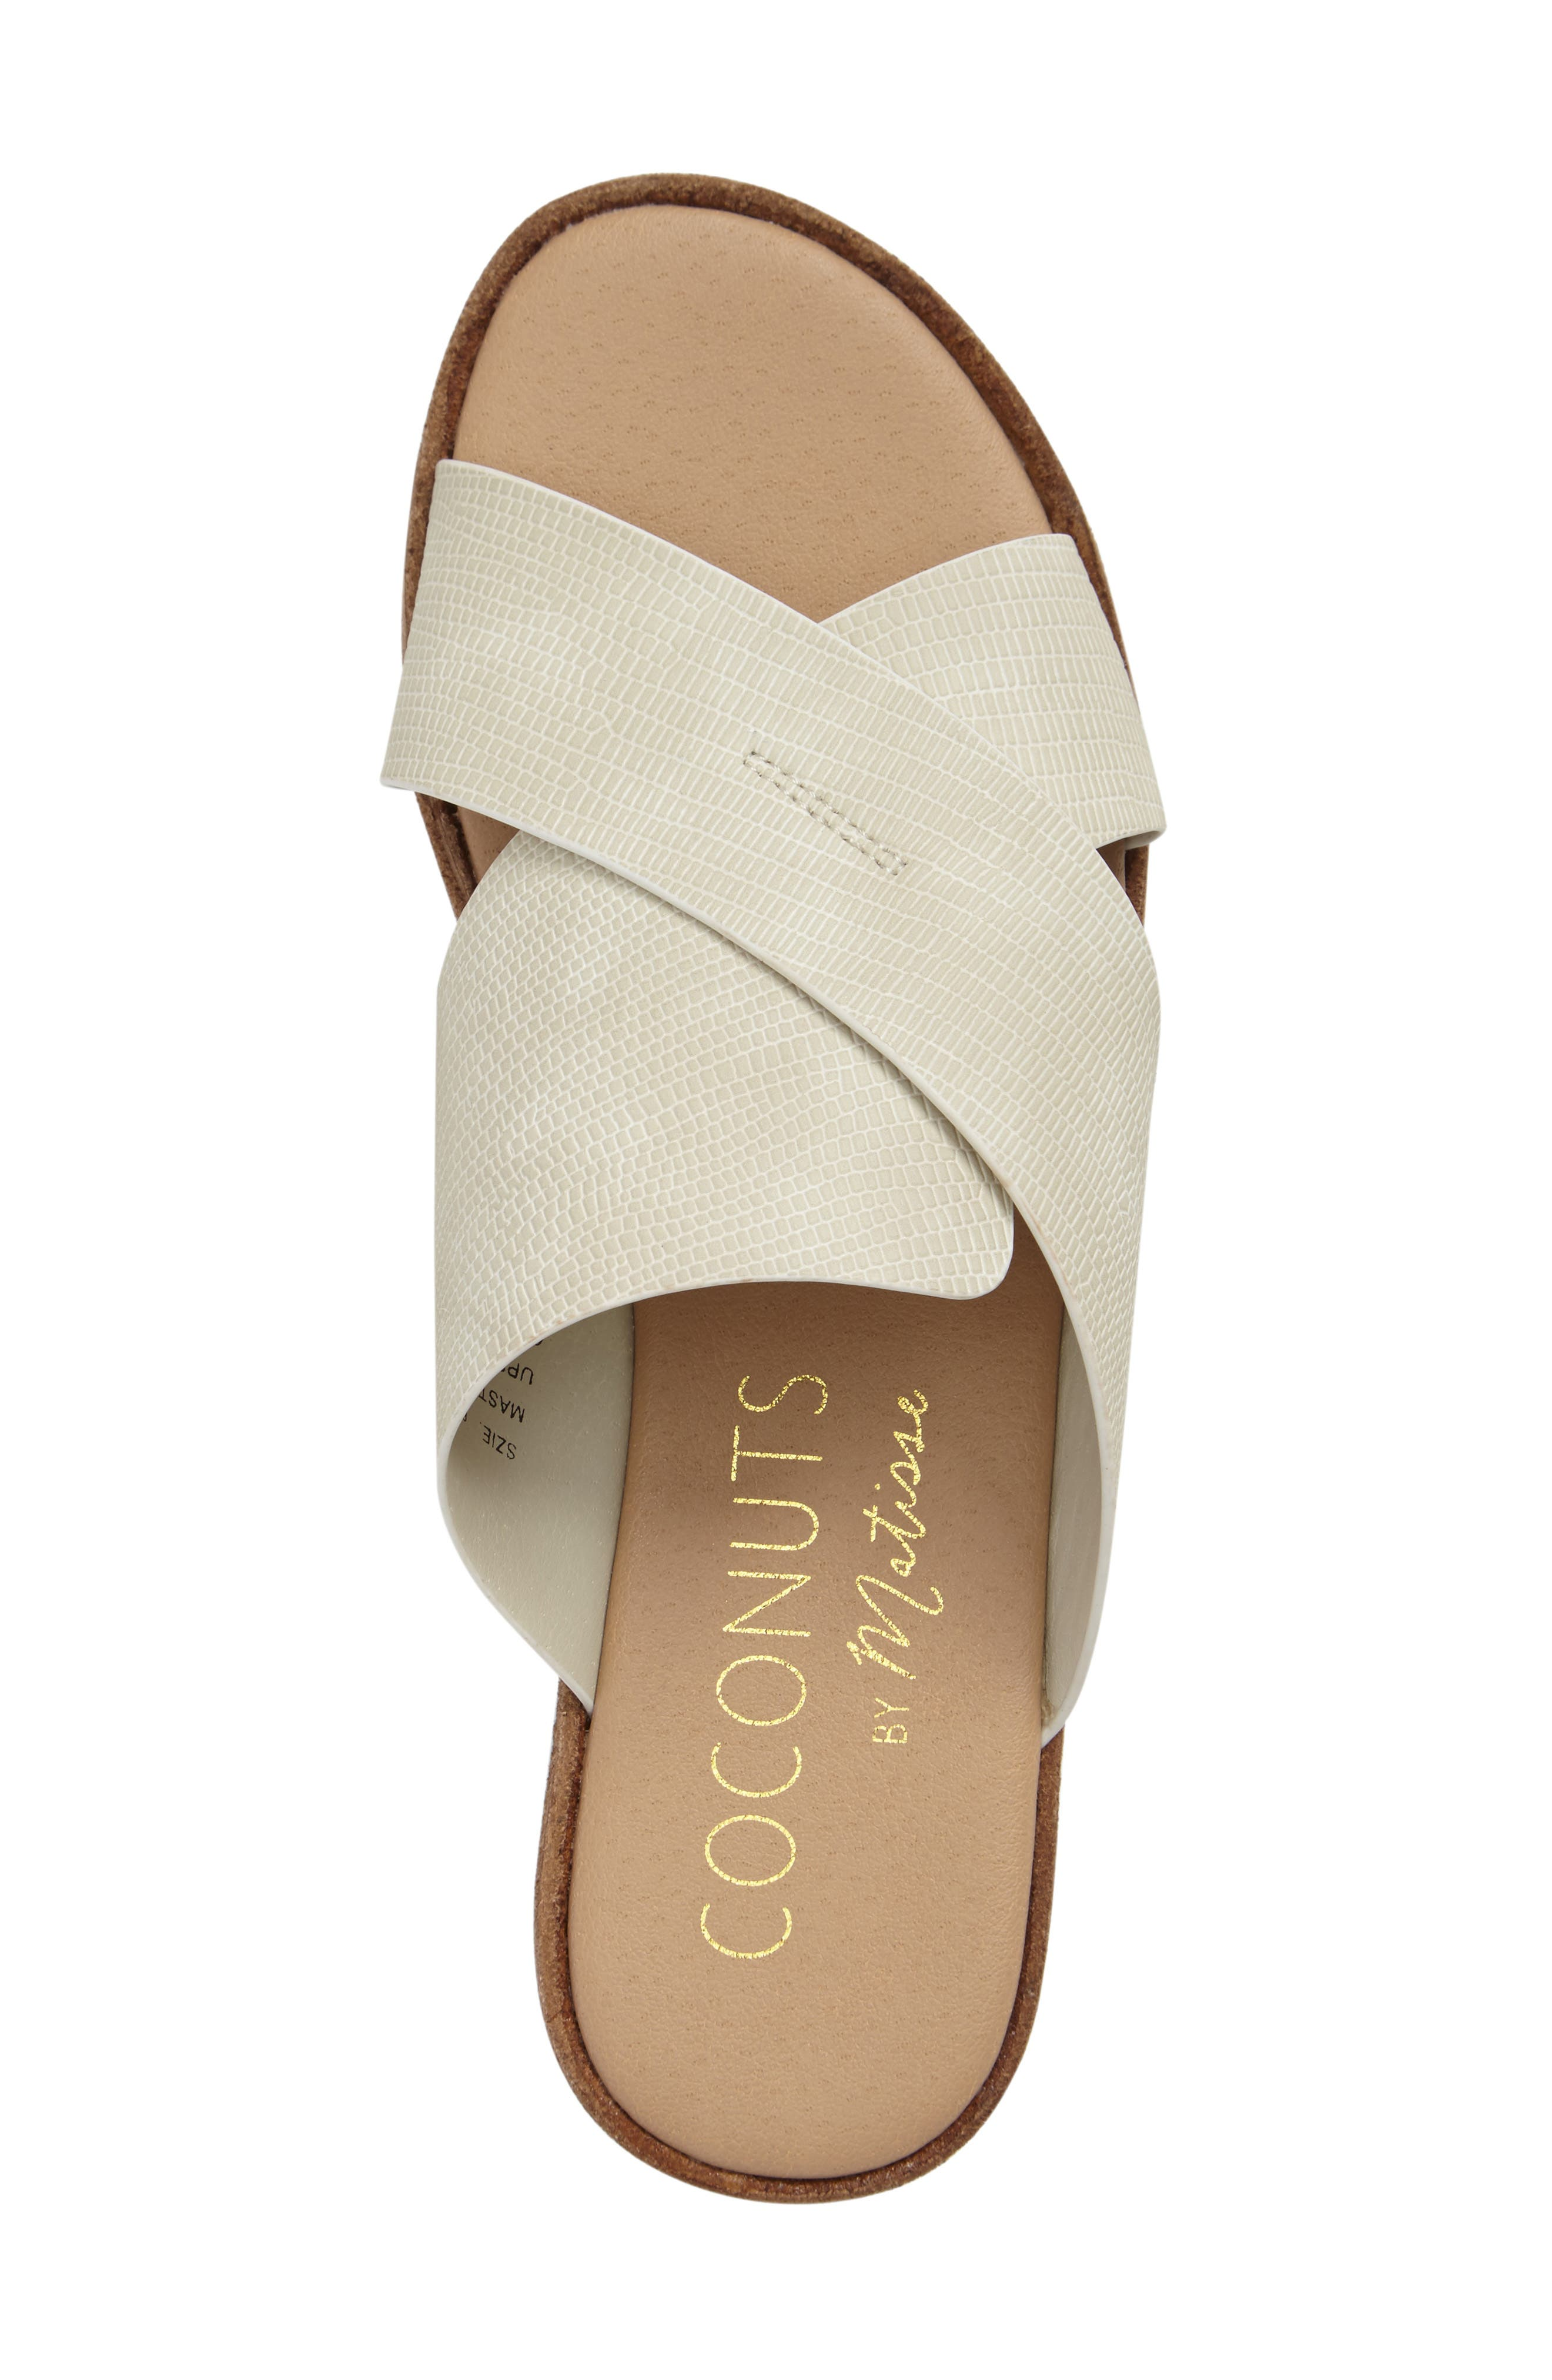 Alternate Image 3  - Coconuts by Matisse Masters Cross Strap Platform Sandal (Women)